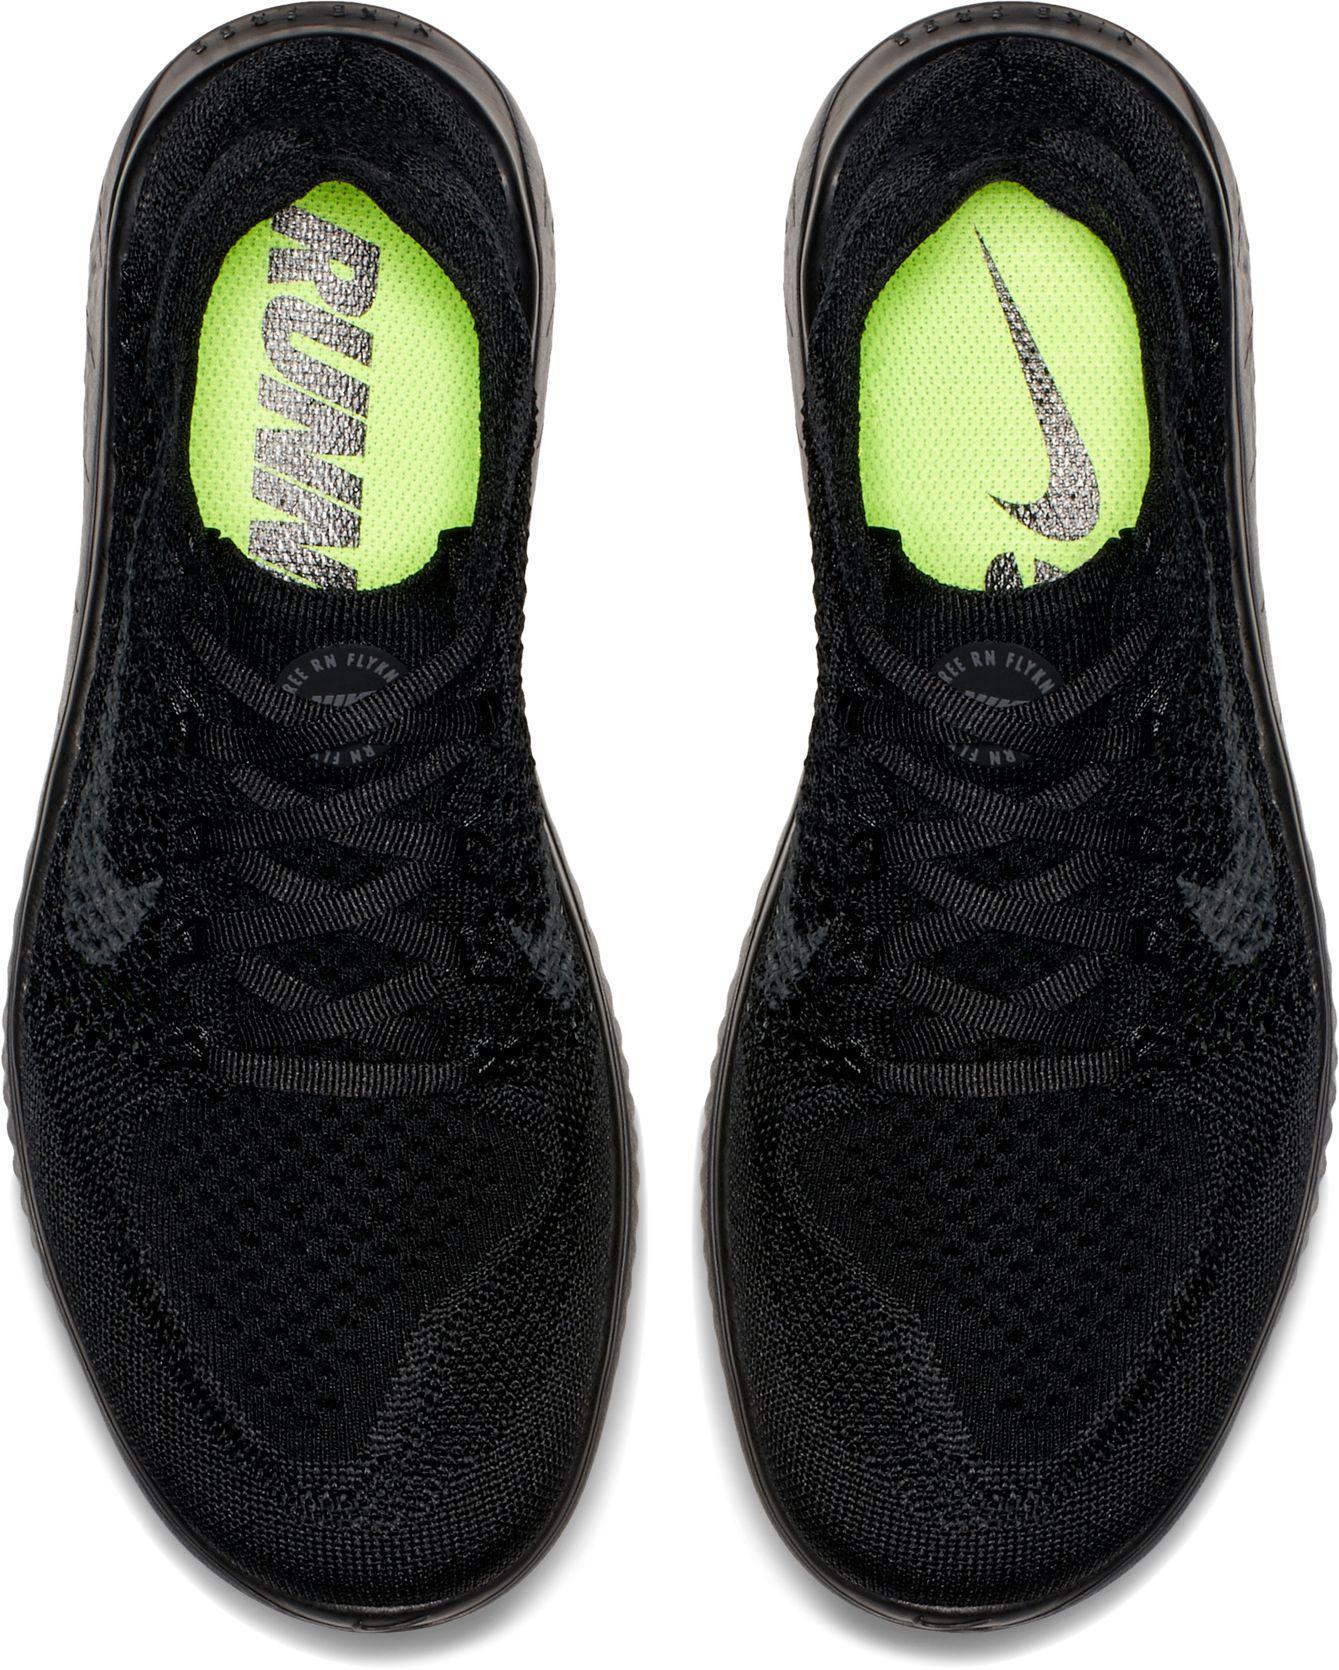 c41554addd35 Lyst - Nike Free Rn Flyknit 2018 Running Shoes in Black